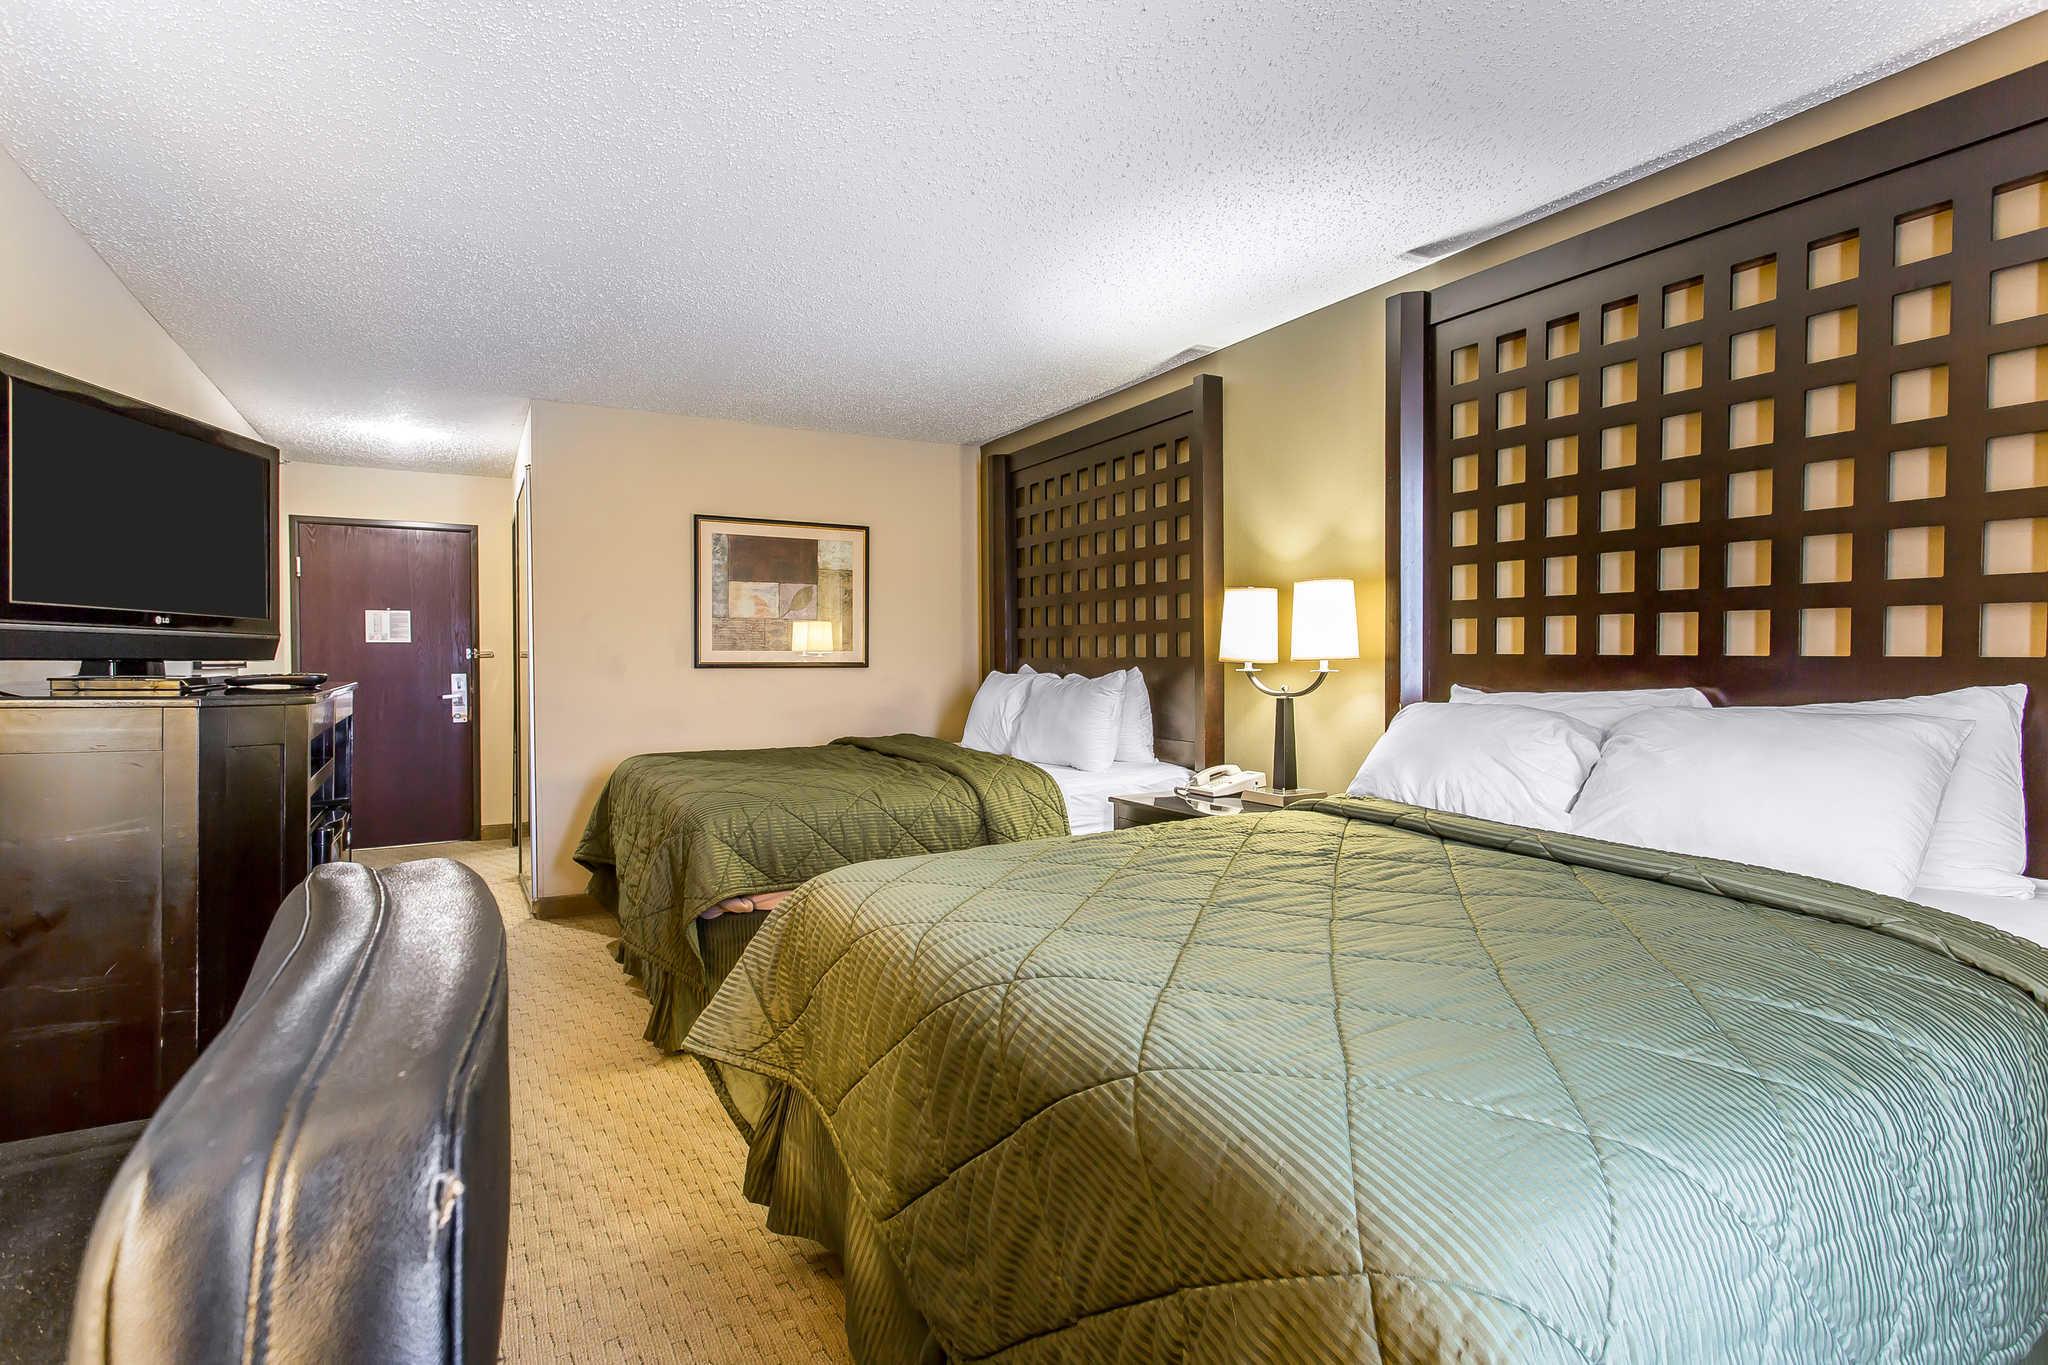 Quality Inn & Suites Durant image 12